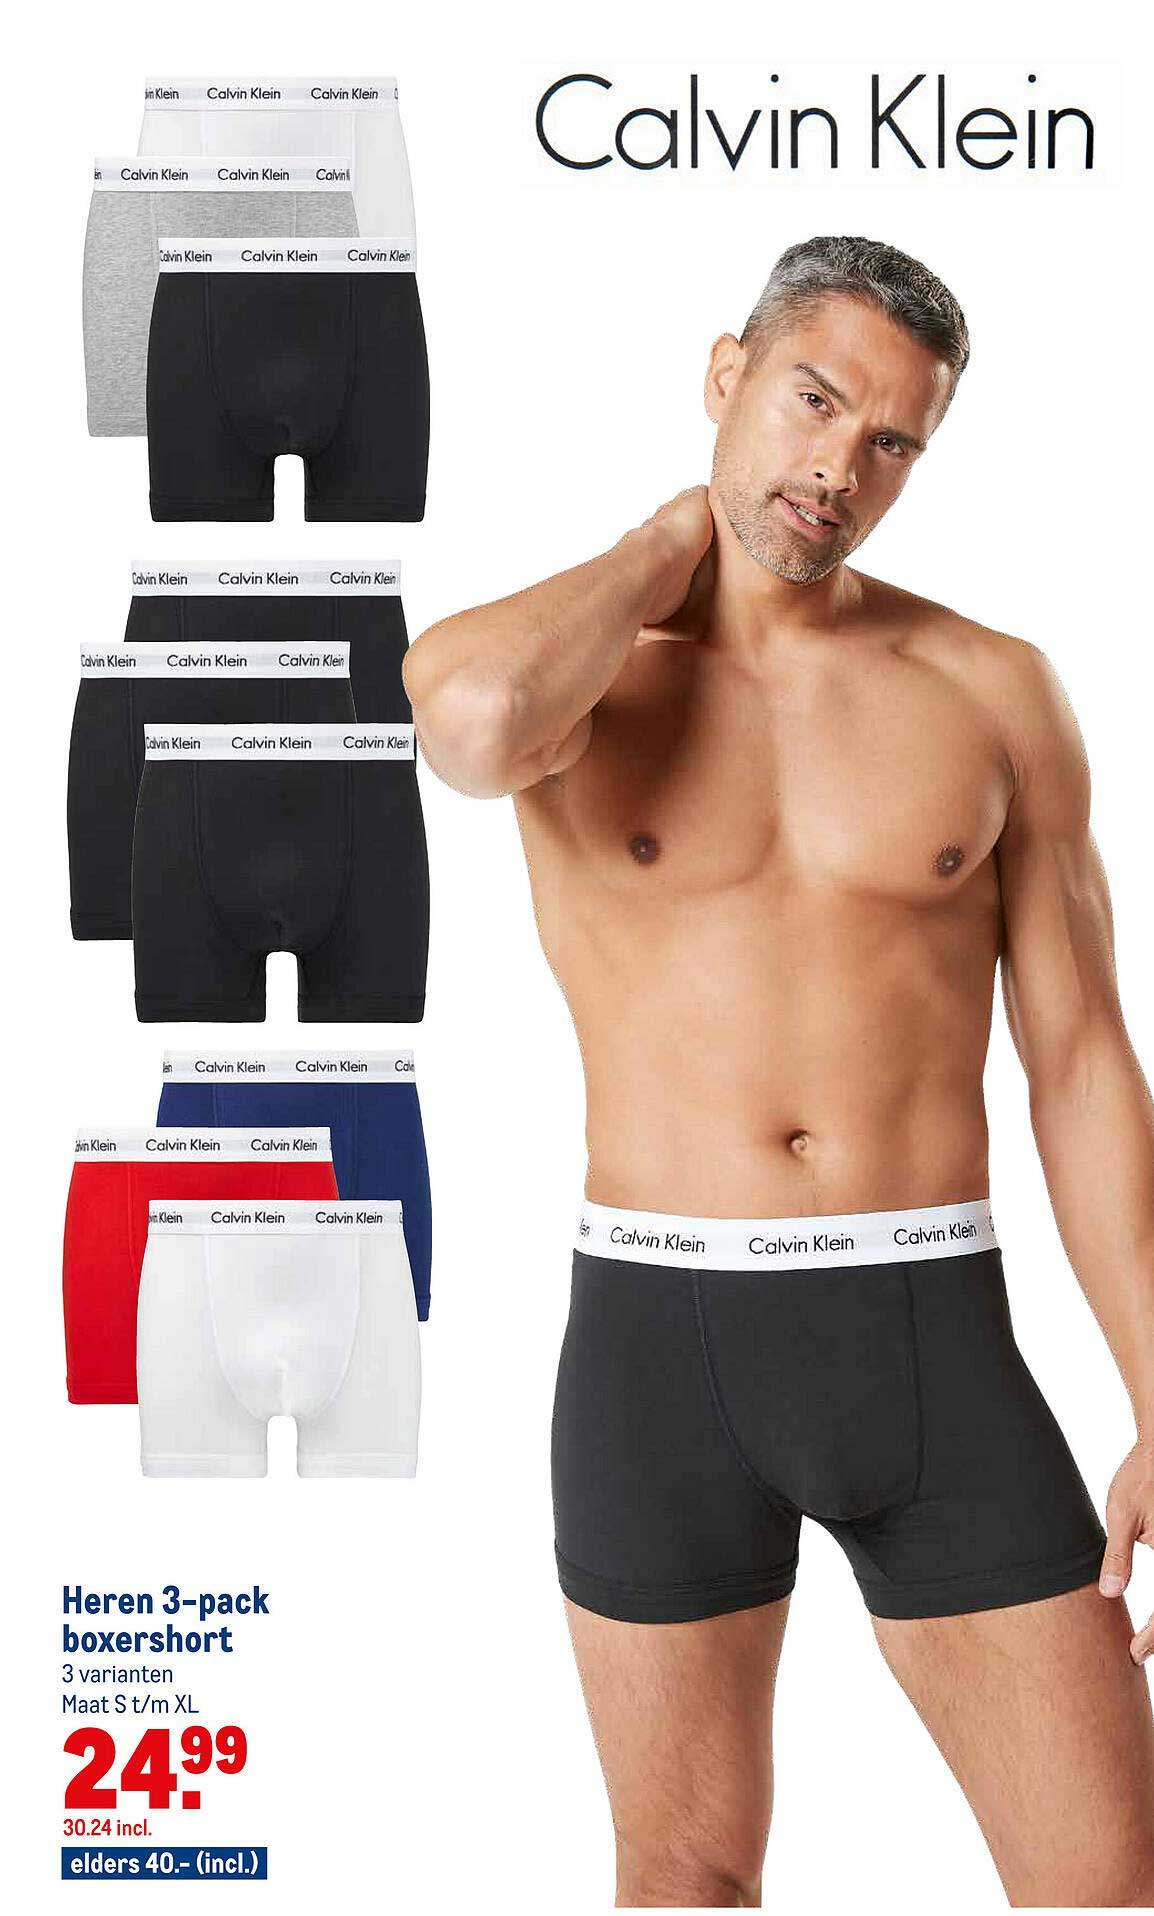 Makro Calvin Klein Heren 3-Pack Boxershort